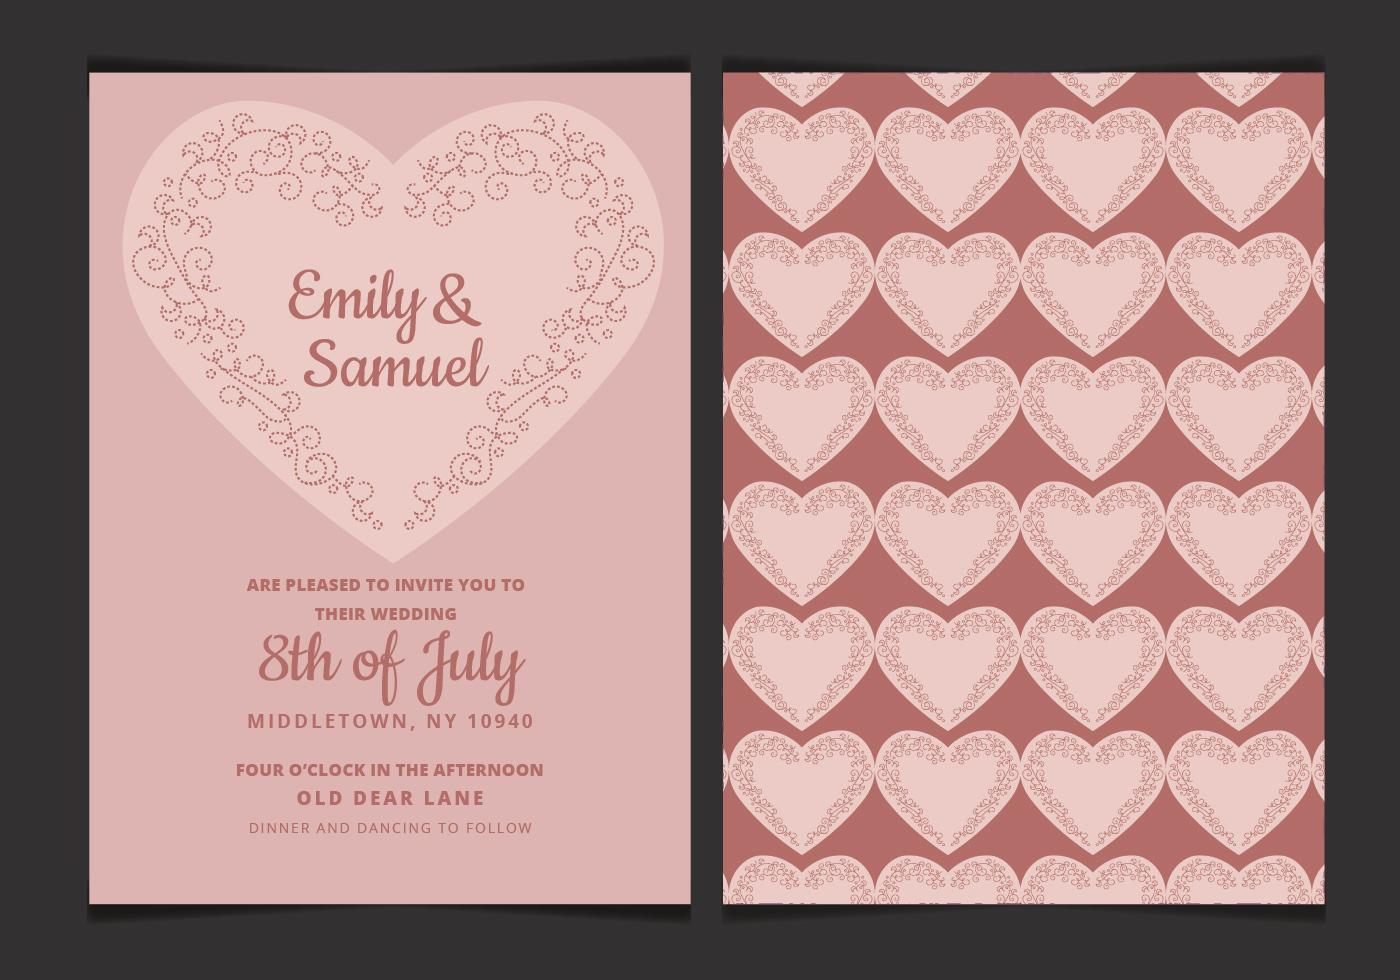 Heart Wedding Free Vector Art 6940 Free Downloads